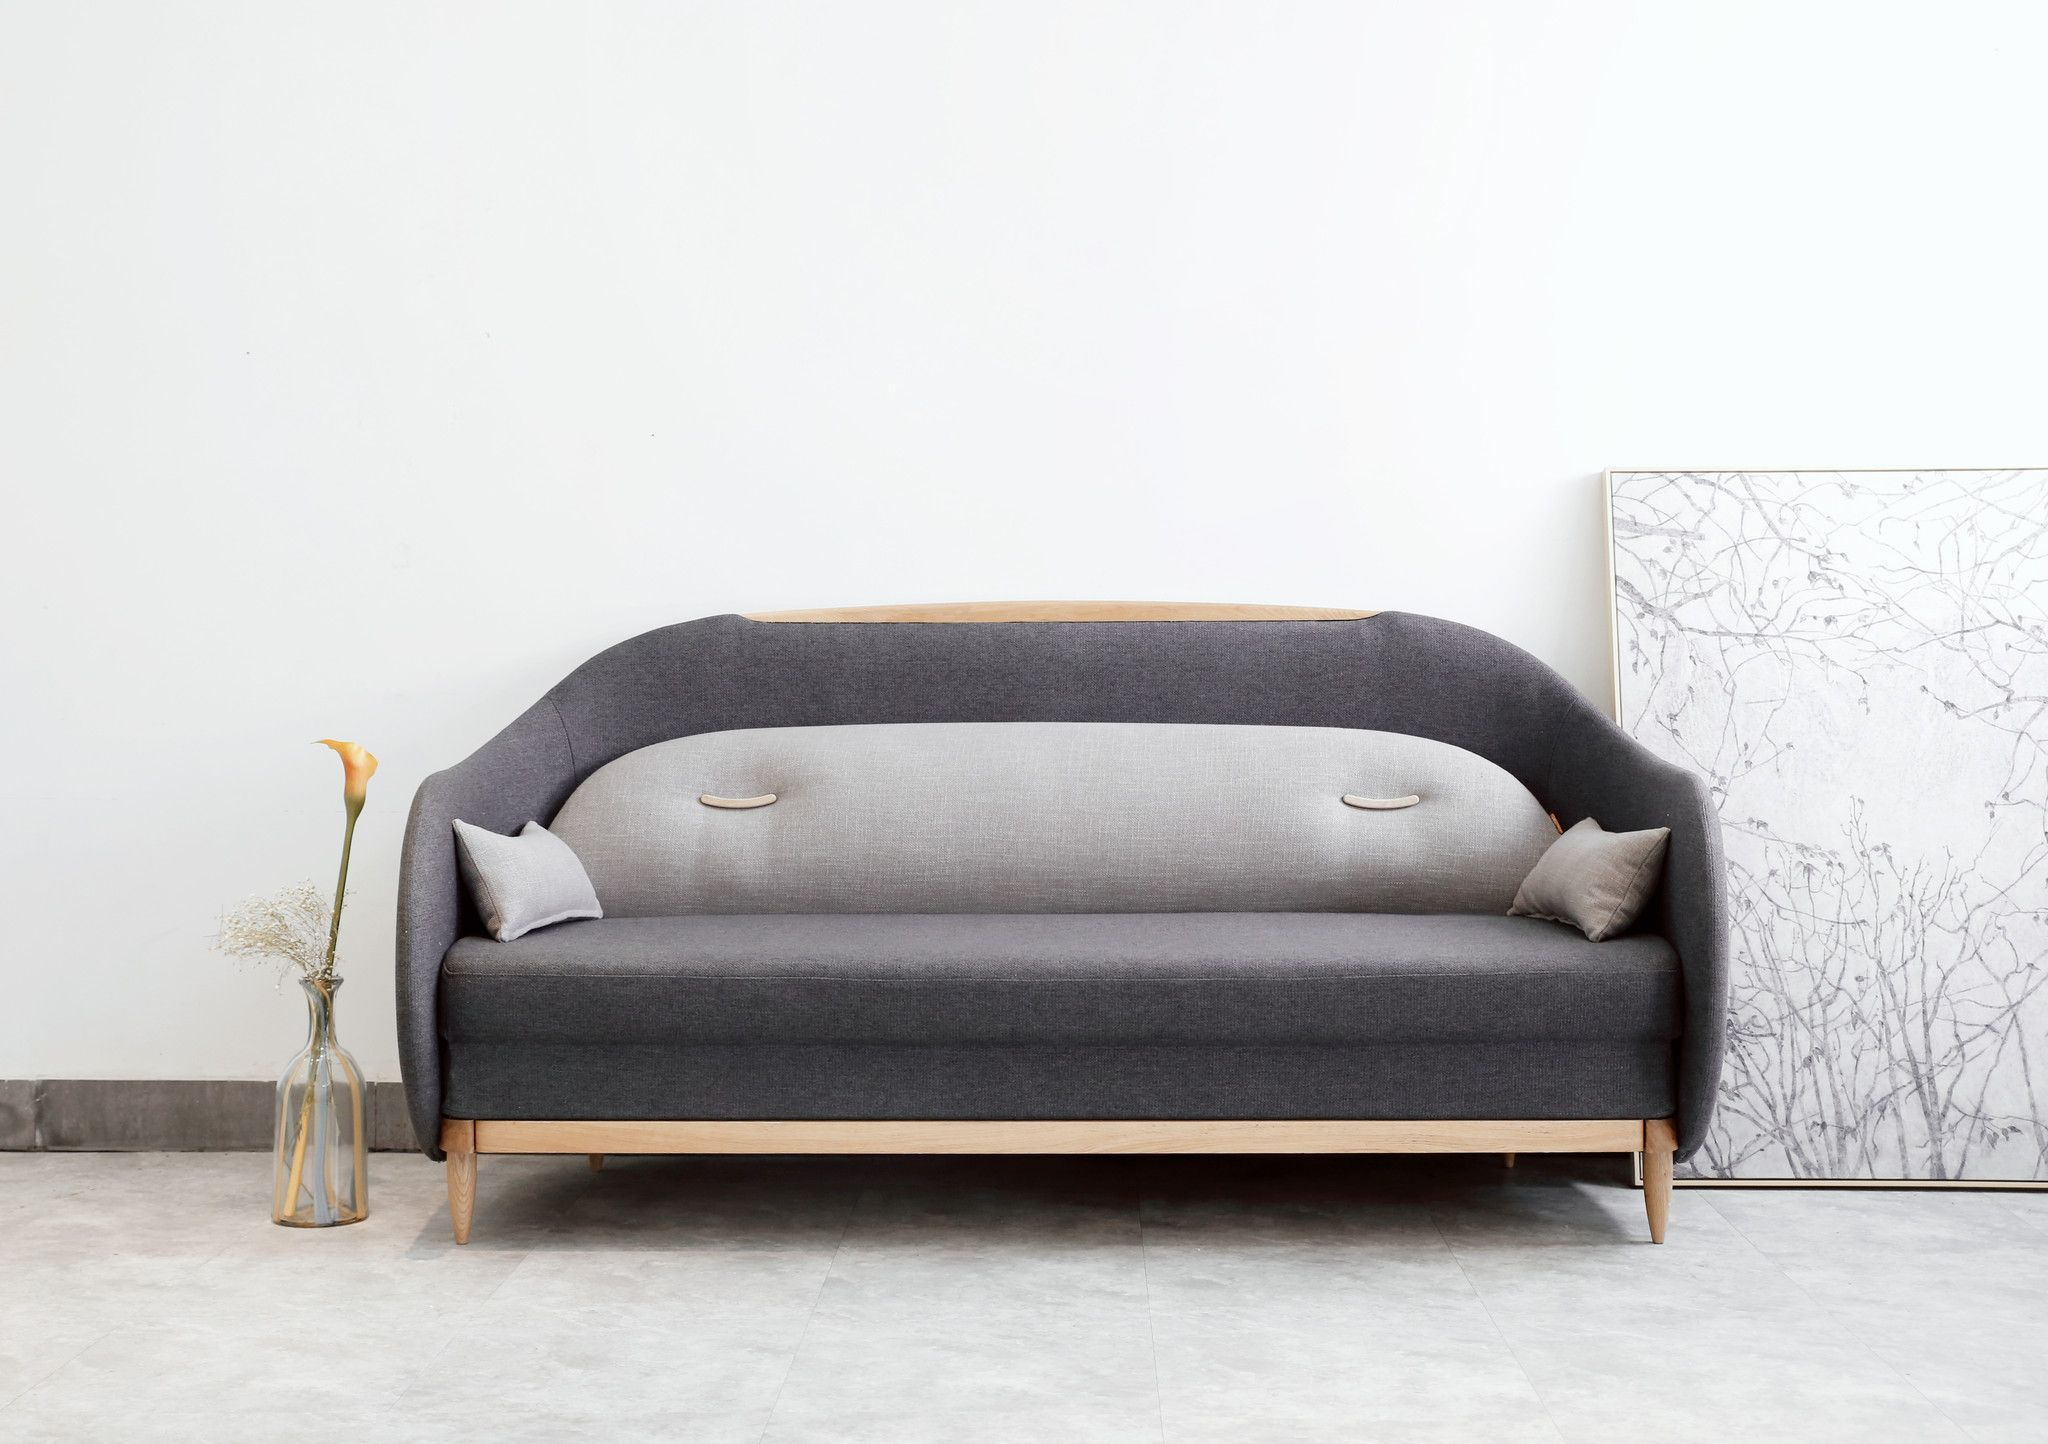 Recess sofa bed from ziinlife modern furniture hong kong